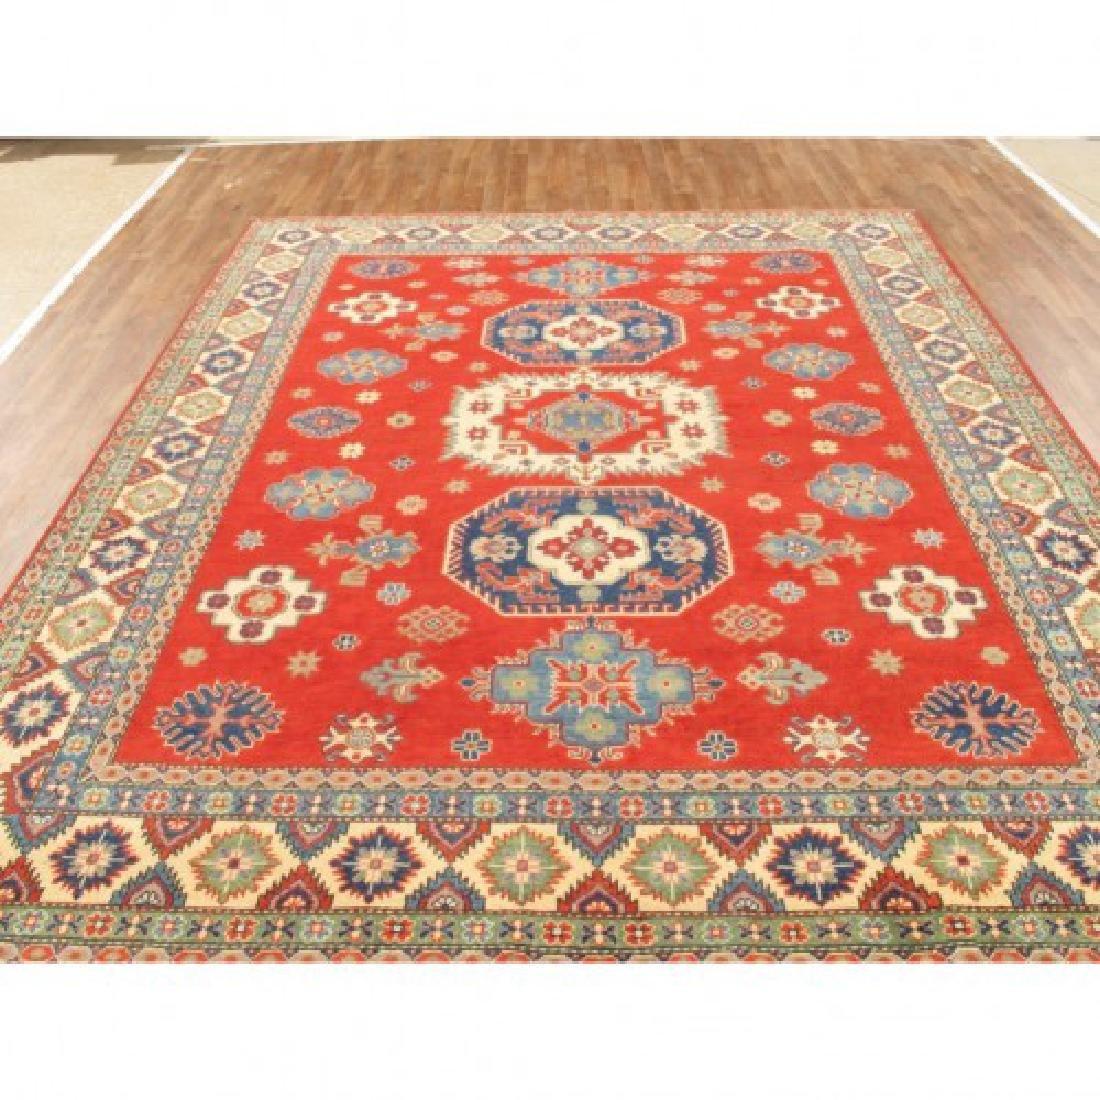 Hand Knotted Wool Kazak Rug 9x10 - 2